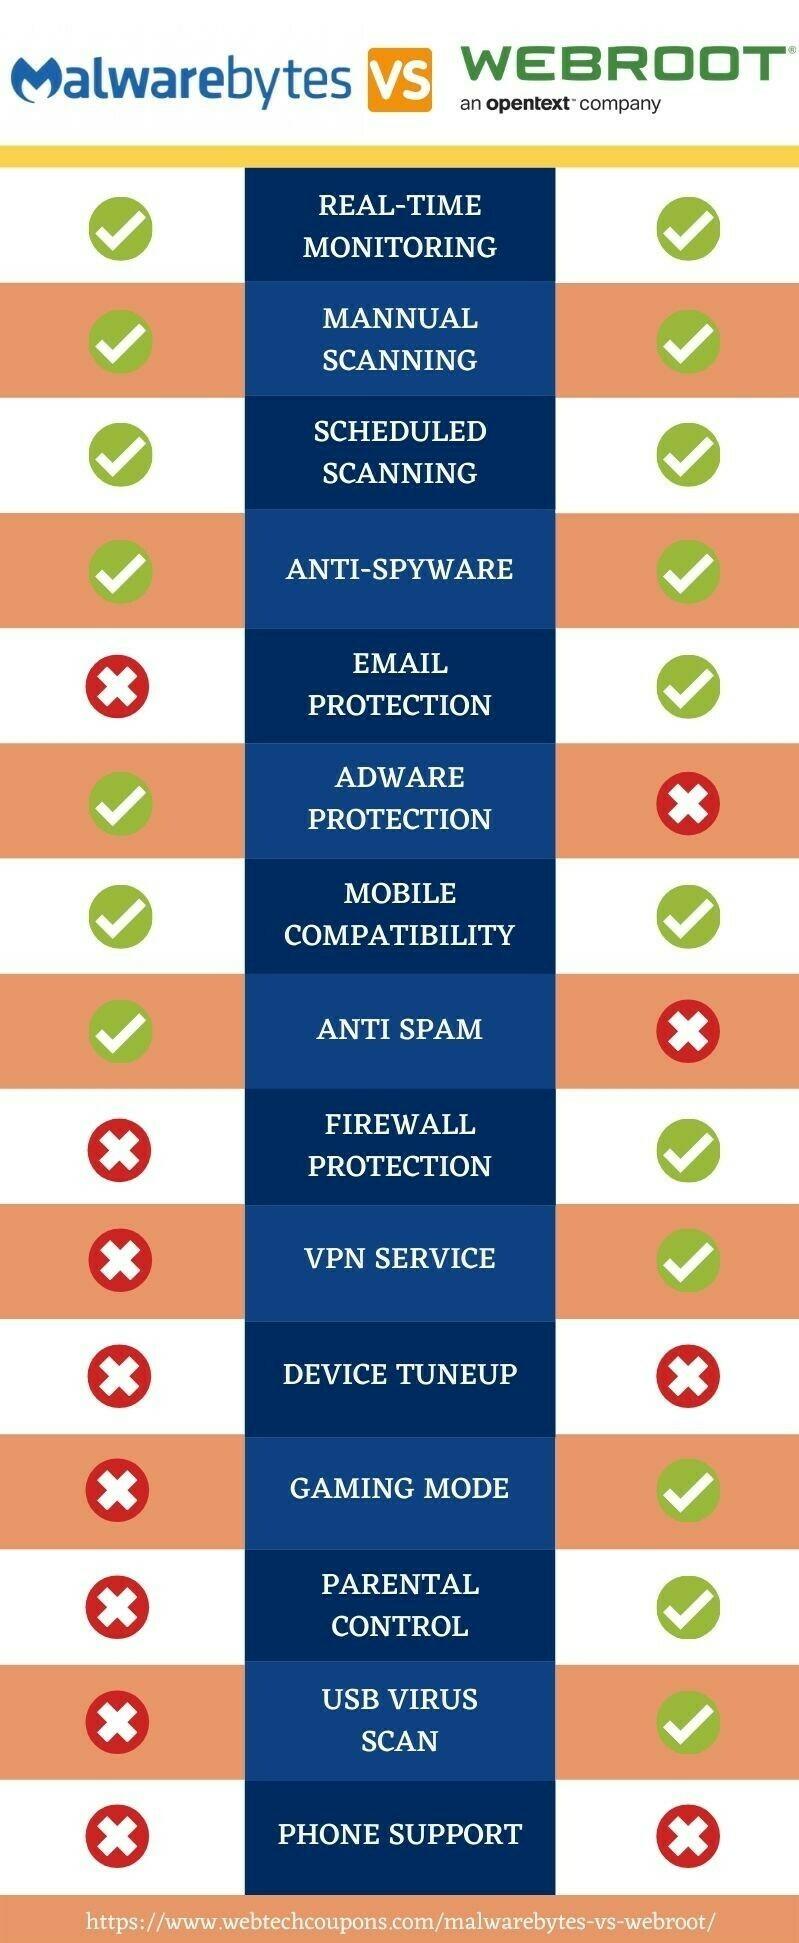 Webroot vs Malwarebytes features www.webtechcoupons.com